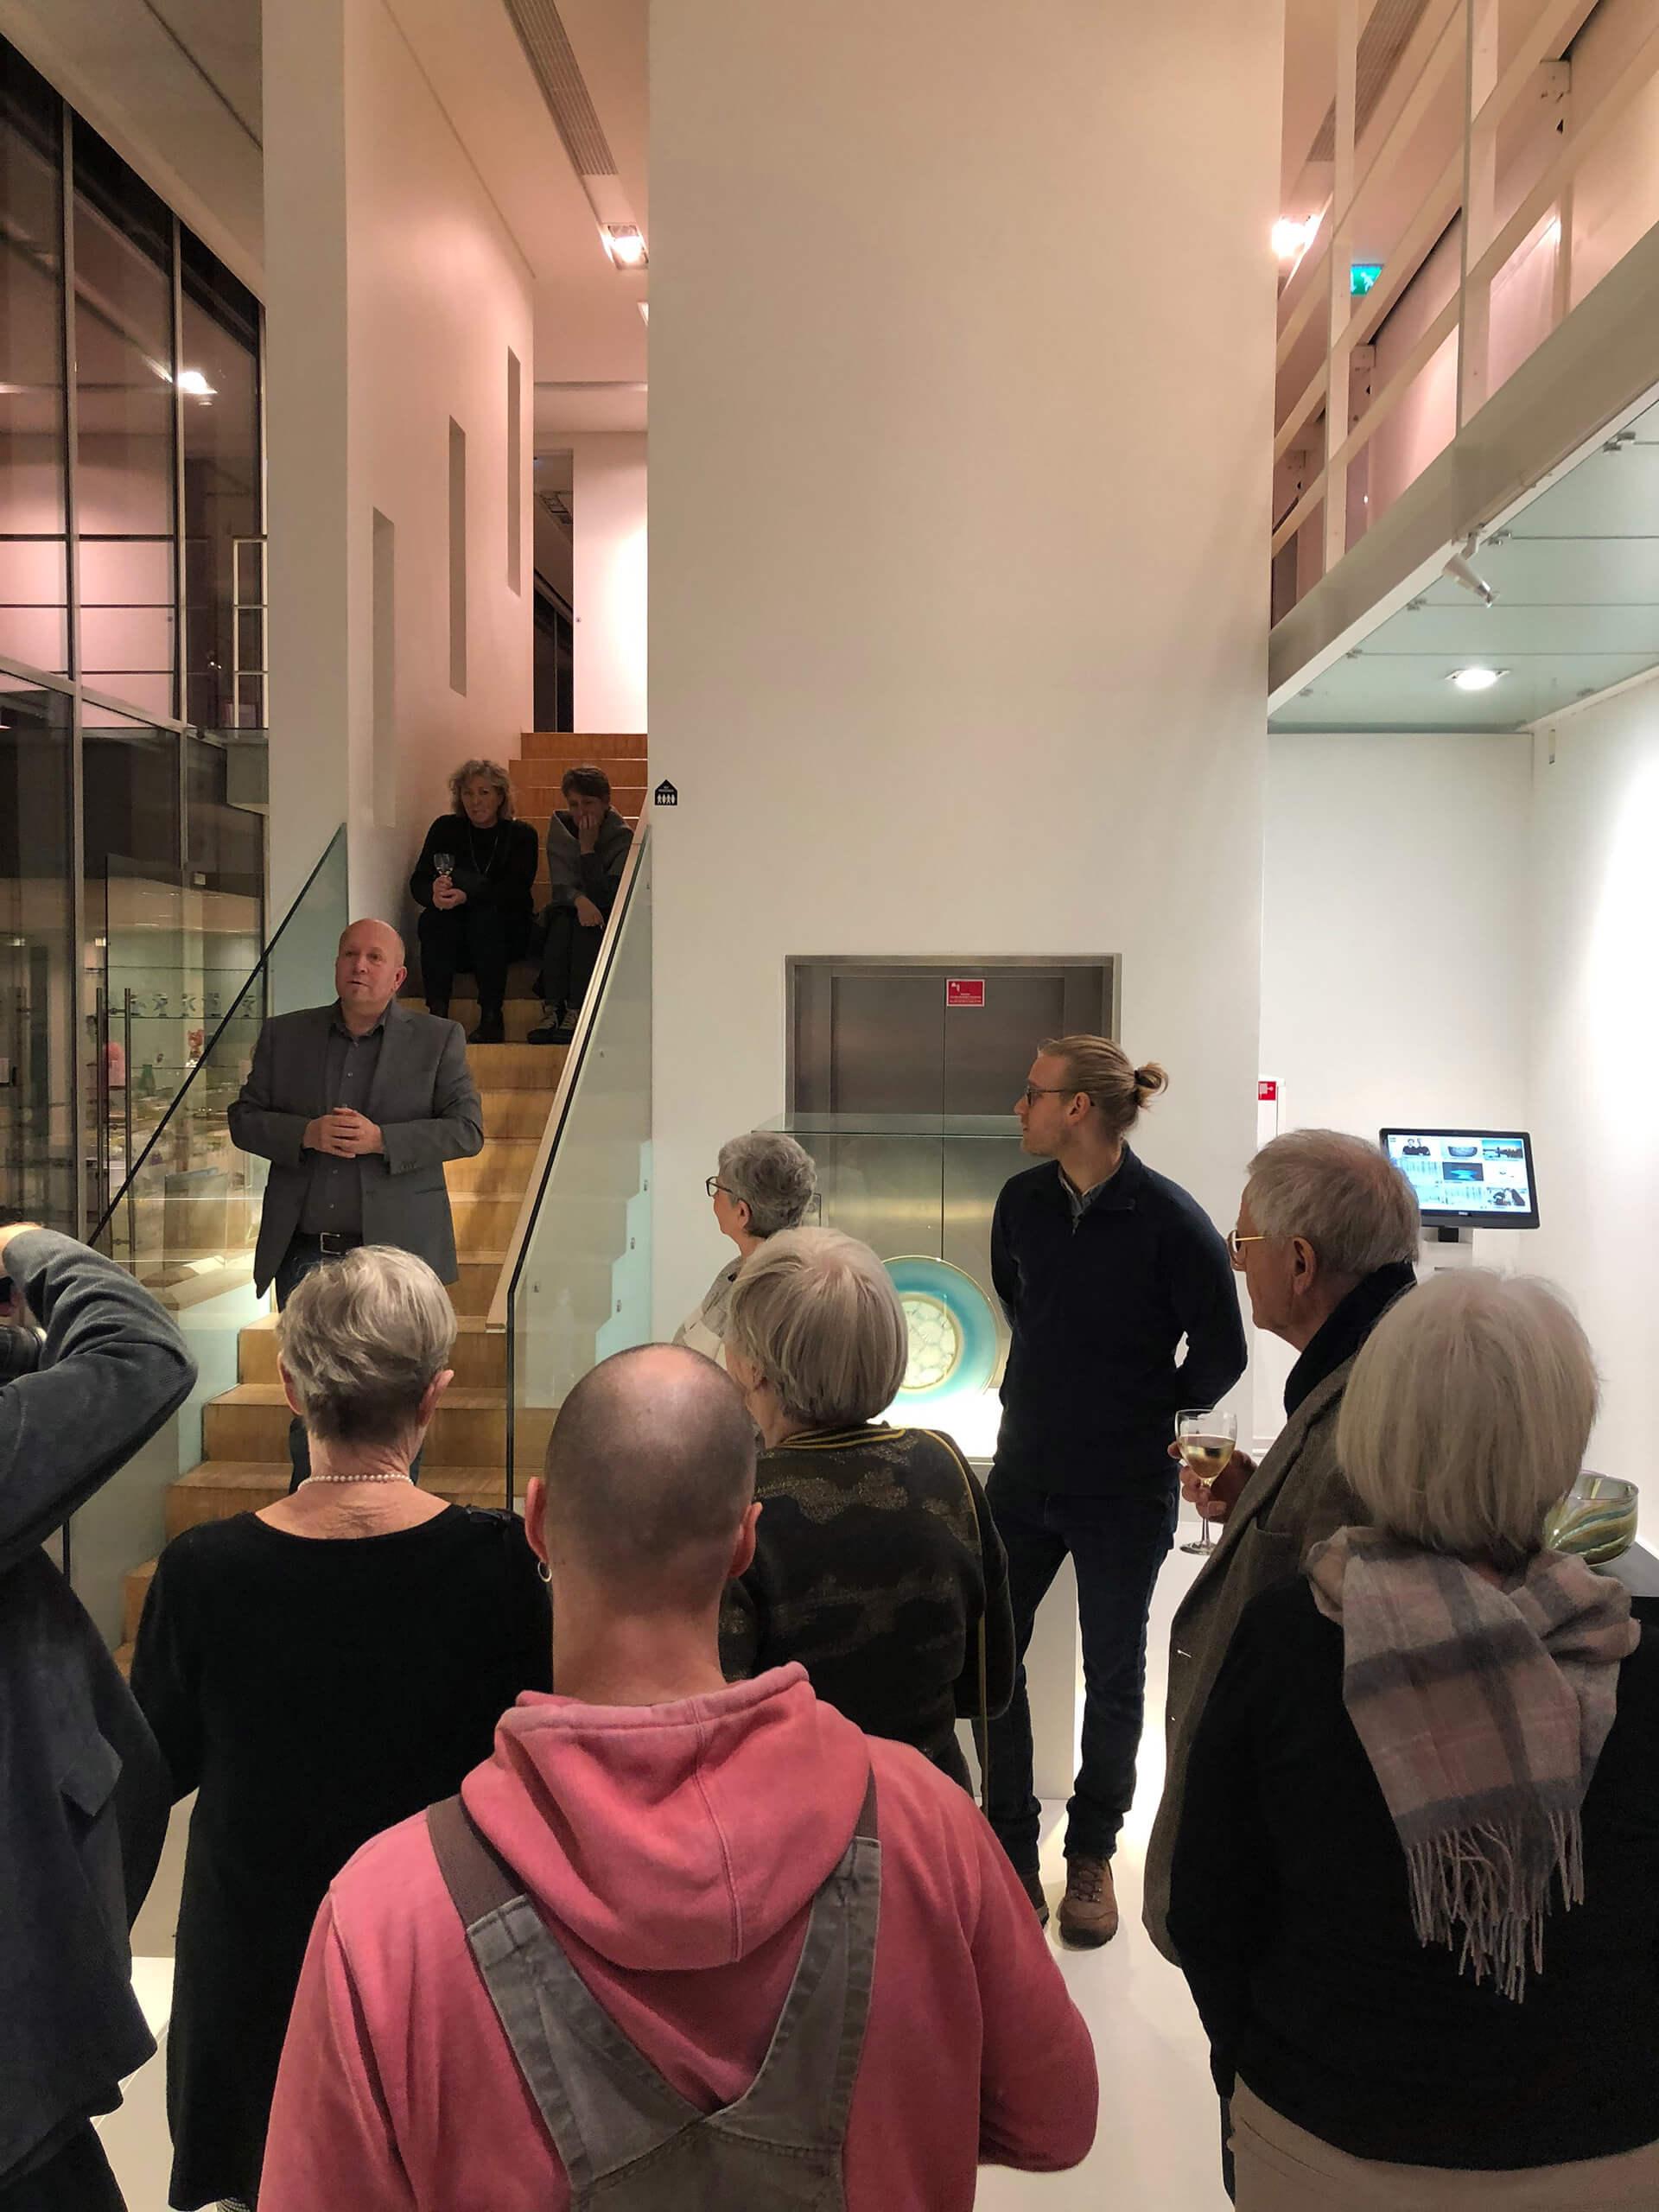 Finn Lynggaard Legat 2020, Jonas Noël Niedermann, Schweizer glaspuster, glaskunst, glasmusseet Ebeltoft